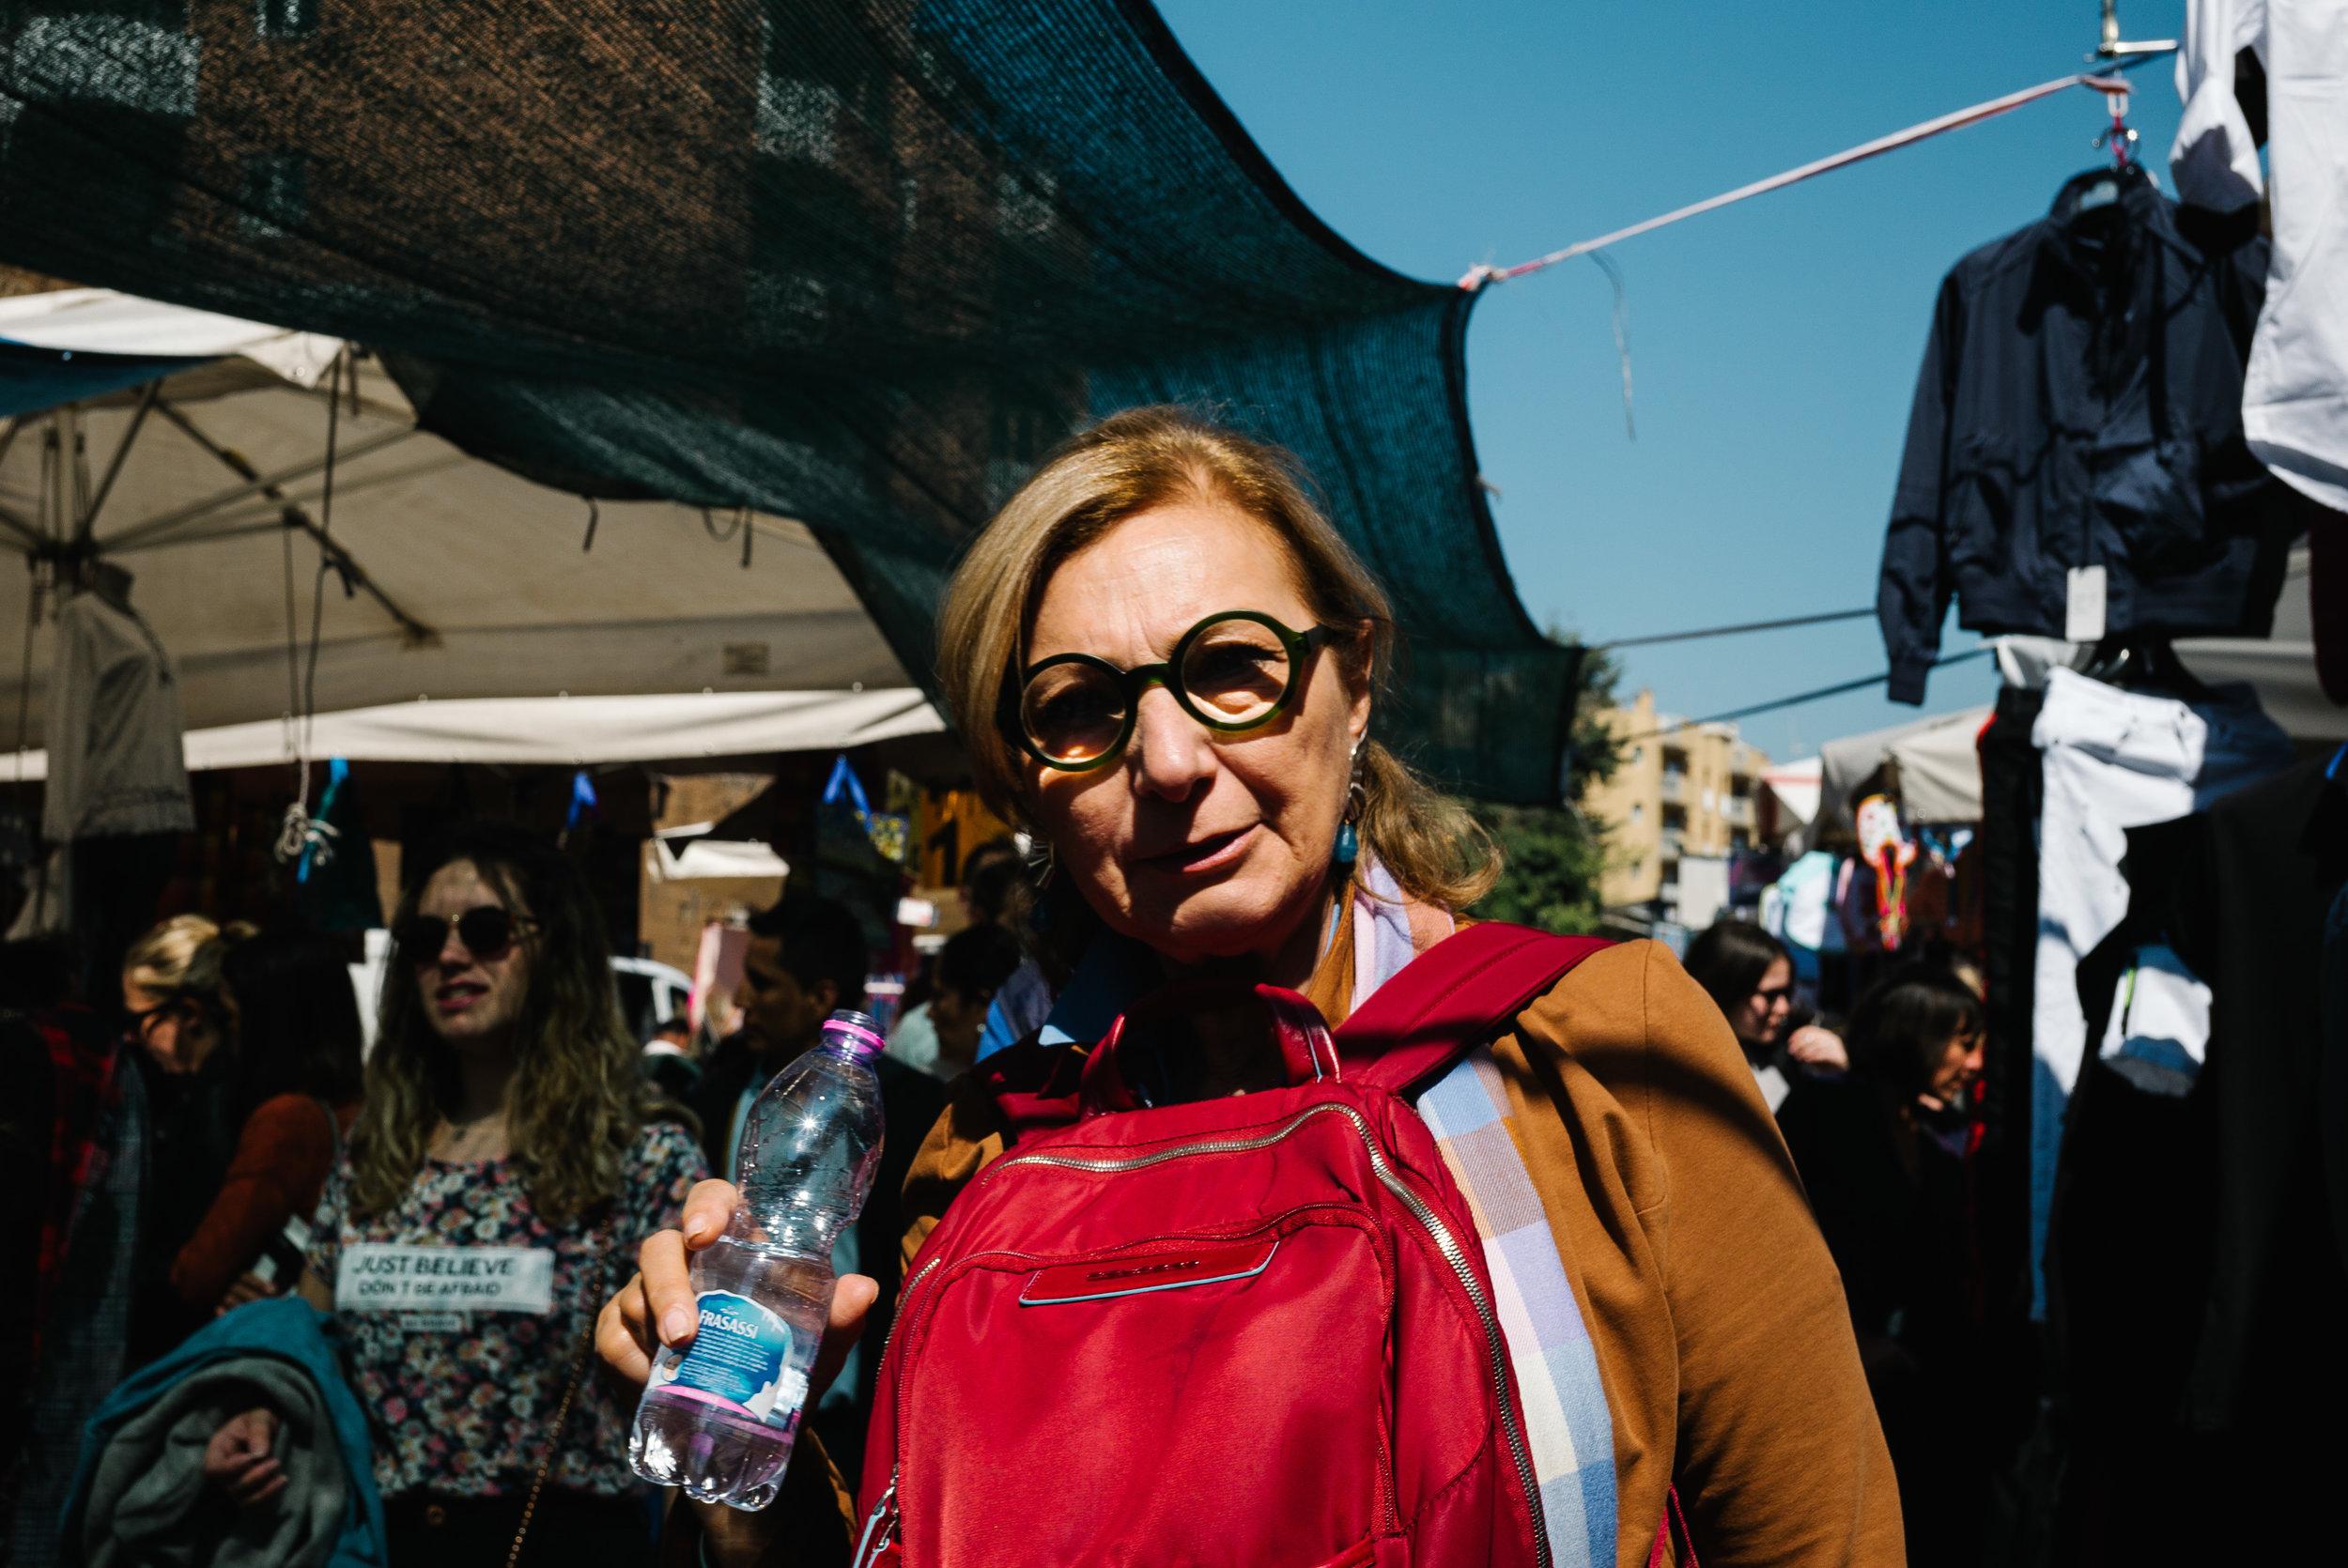 Porta Portese Market - Clifford Darby 2019